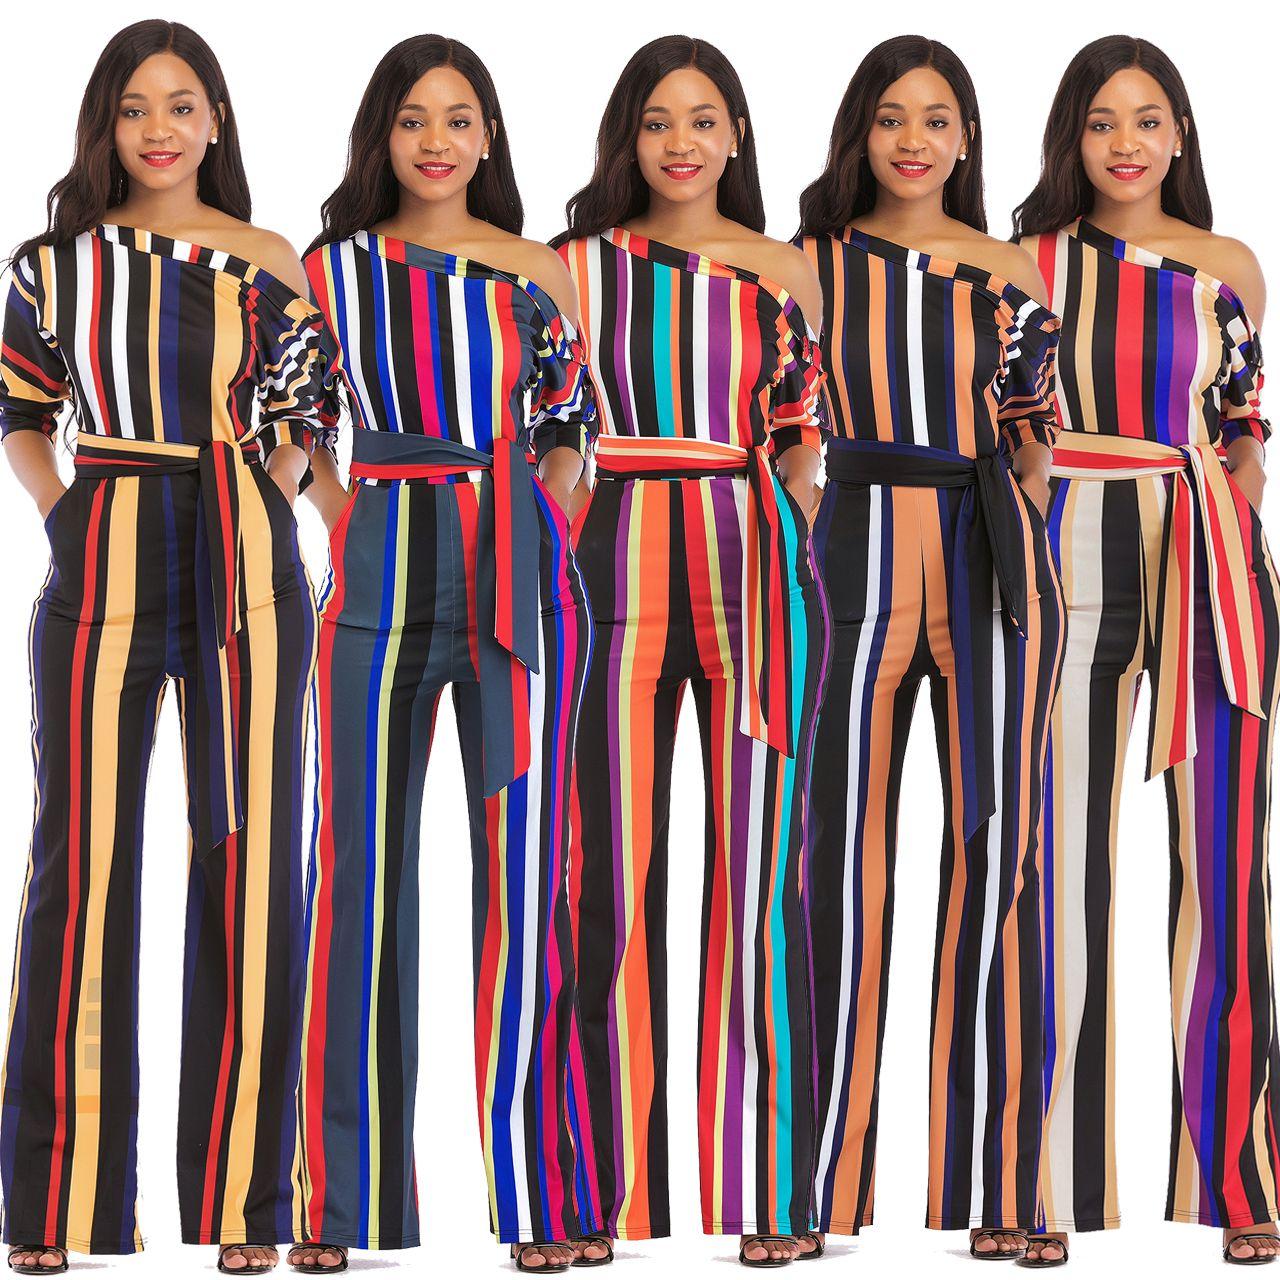 425883bac73 2019 2018 Striped Flower Print Sexy Summer Jumpsuit Romper Women Deep V  Neck Stripe Long Playsuit Boho Beach Jumpsuit Female Overalls M738 From  Hengda999